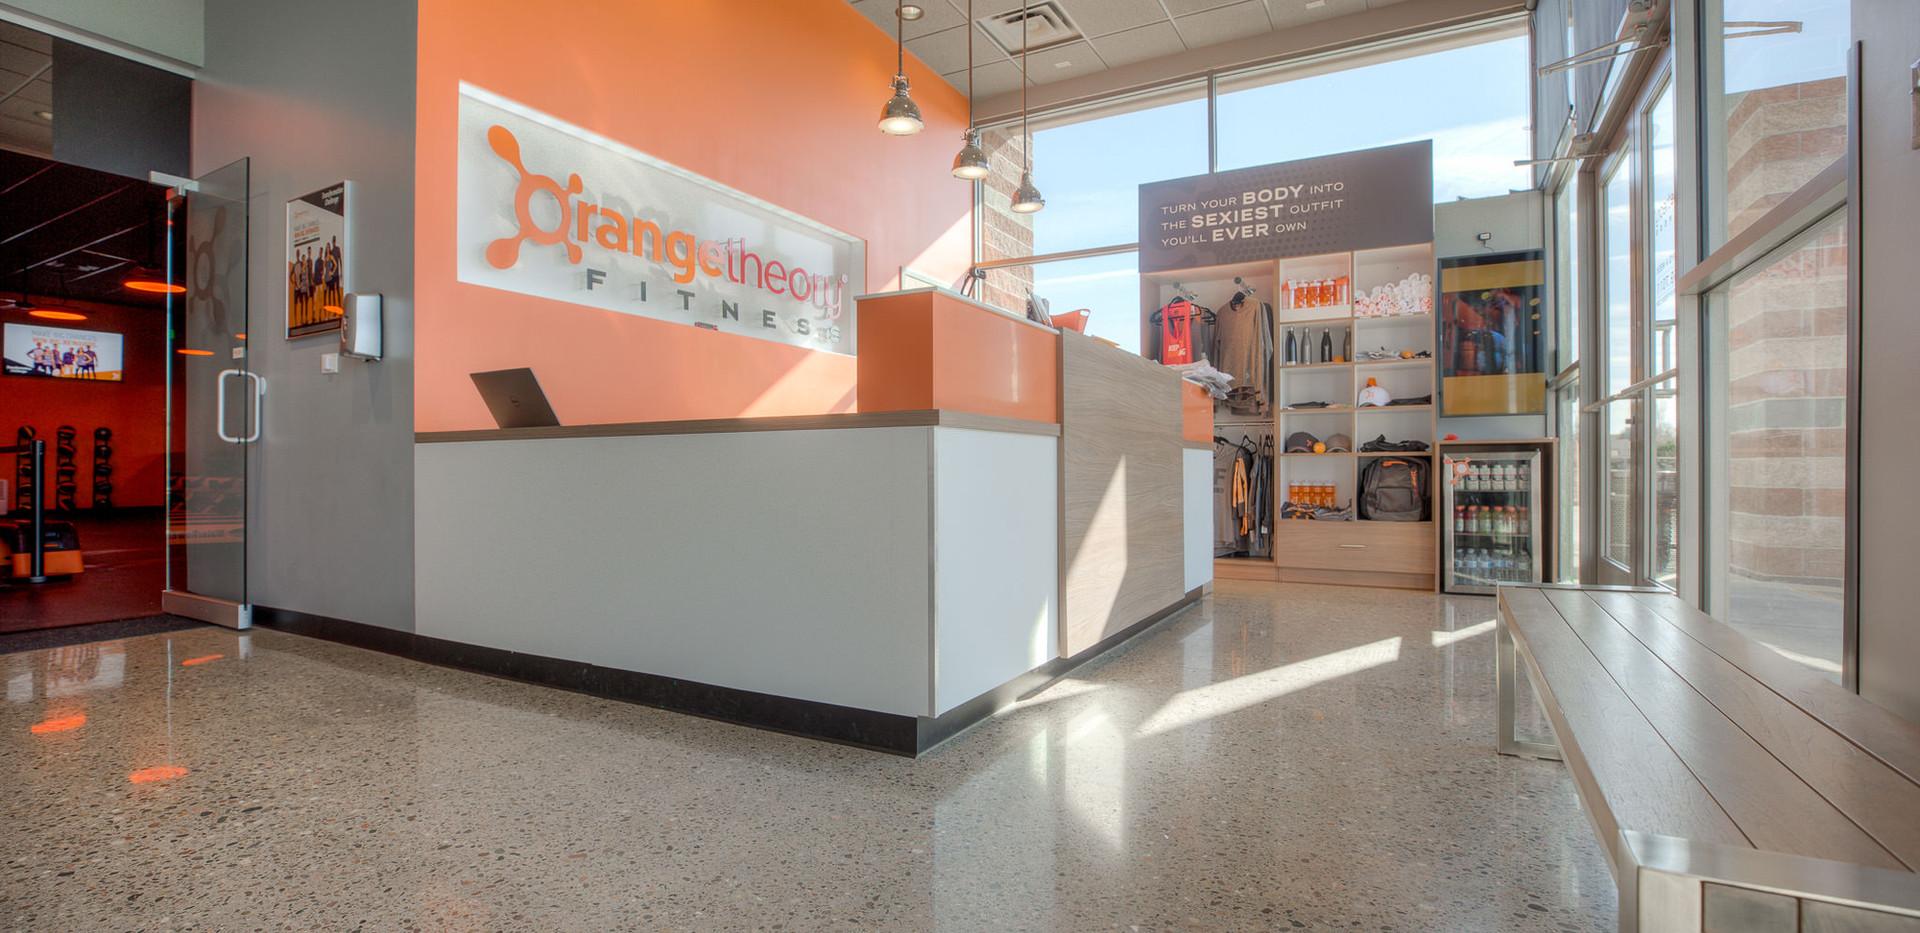 Orange Thoery Fitness